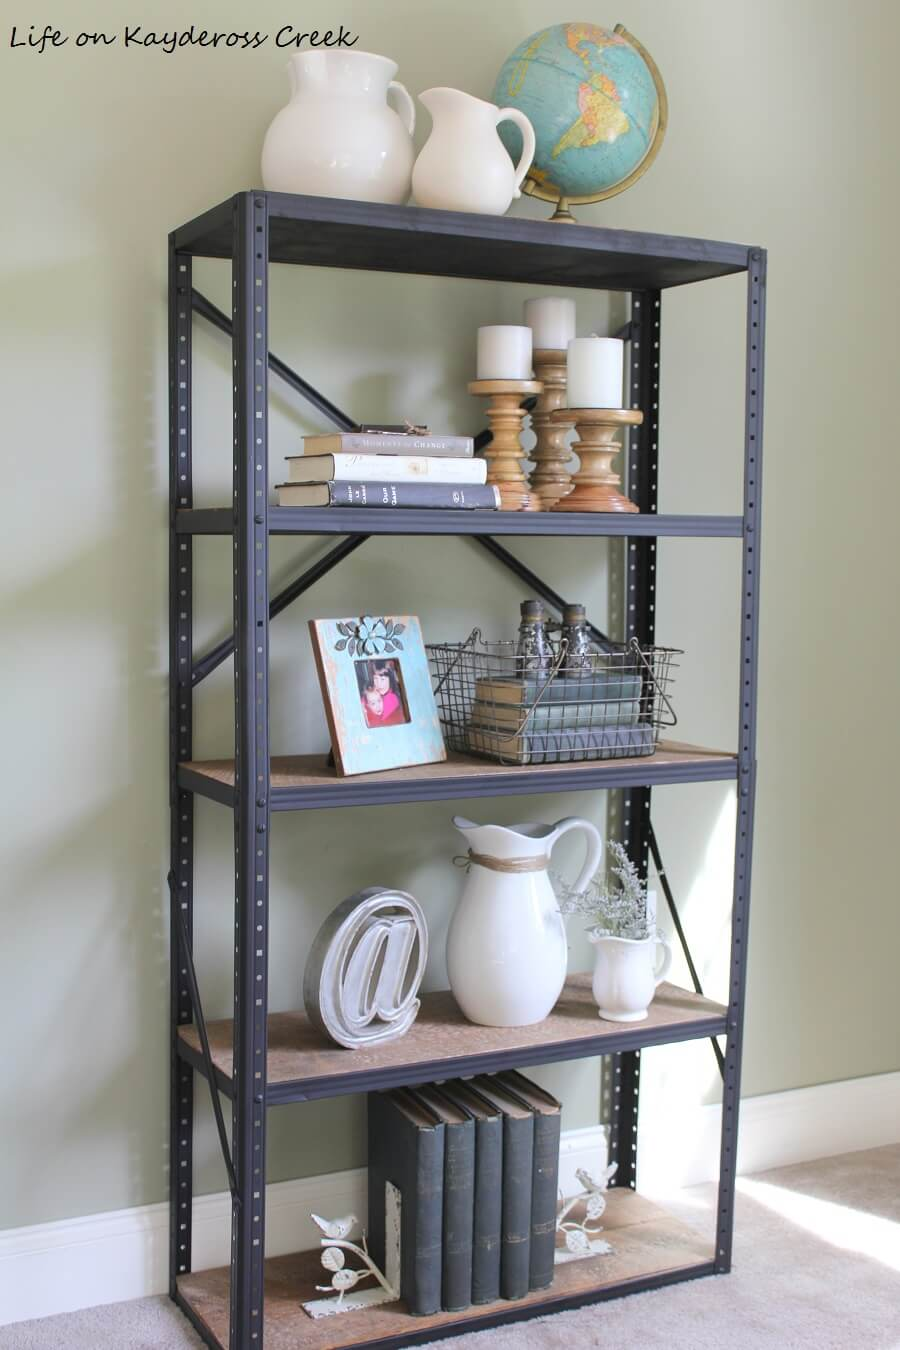 Black Industrial Bookshelf with Wooden Shelves